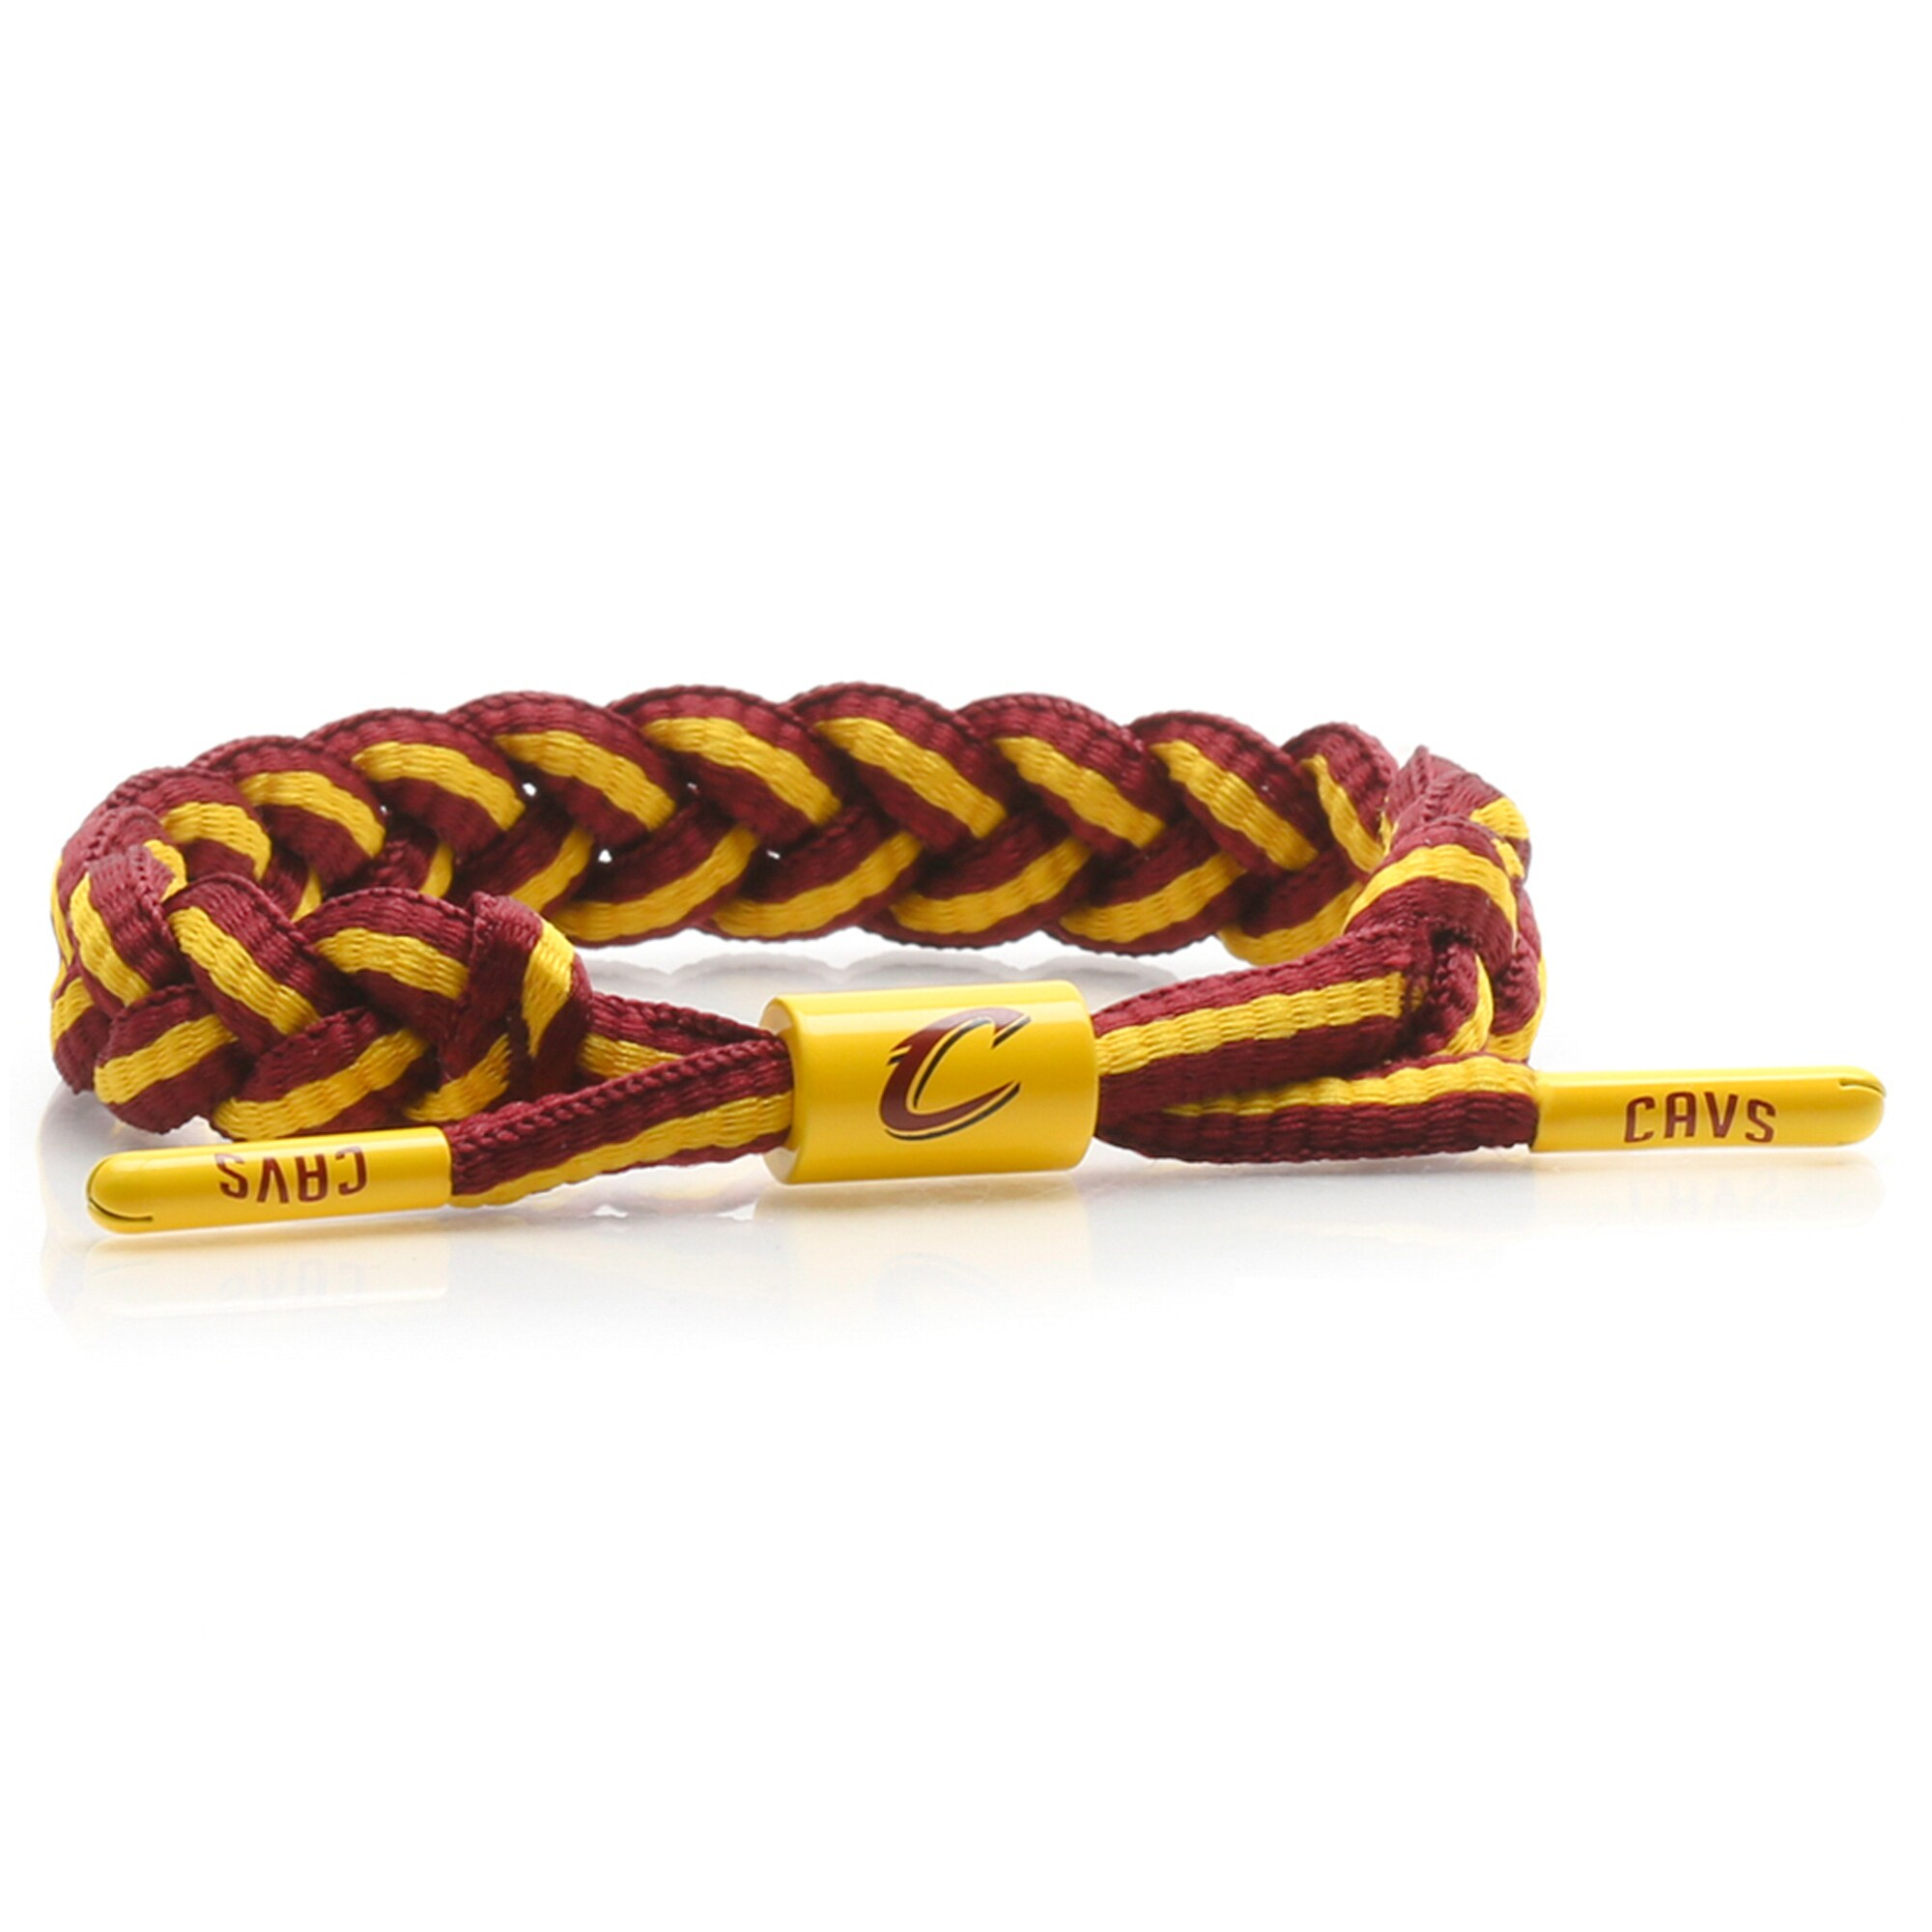 Cleveland Cavaliers Rastaclat Team Bracelet